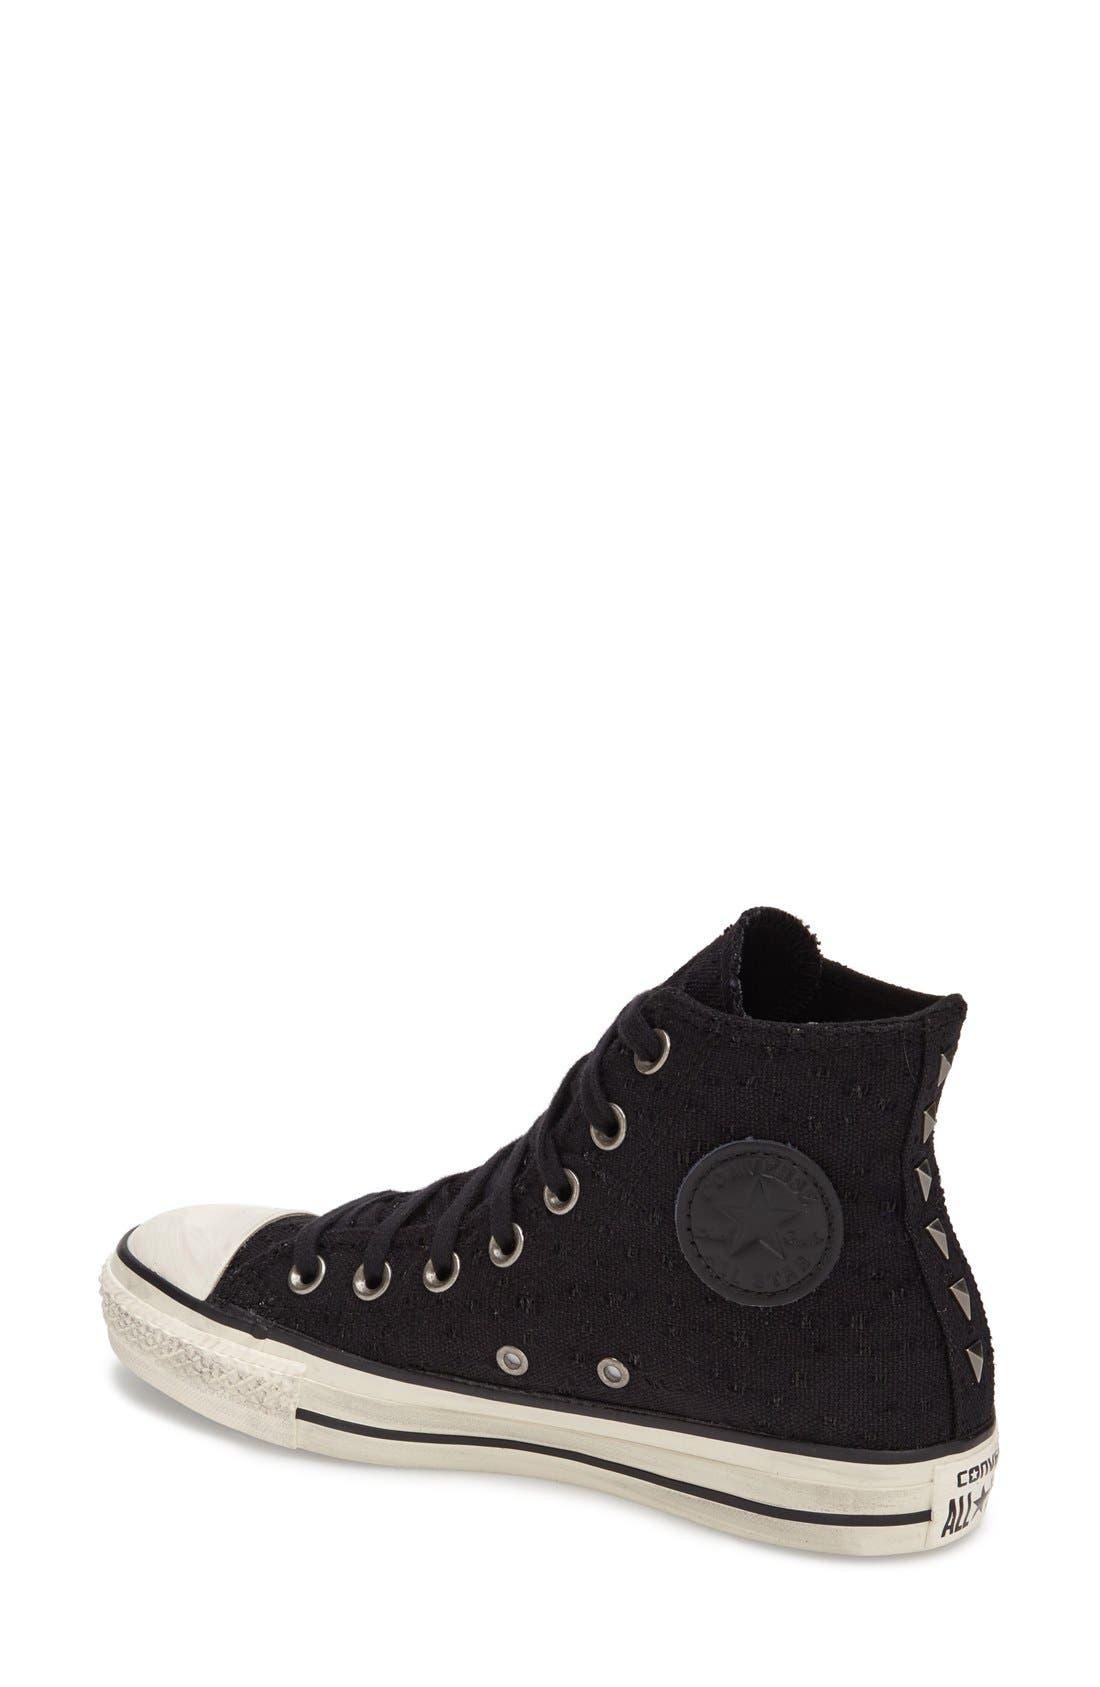 Alternate Image 2  - Converse Chuck Taylor® All Star® 'Star Hardware' High Top Sneaker (Women)